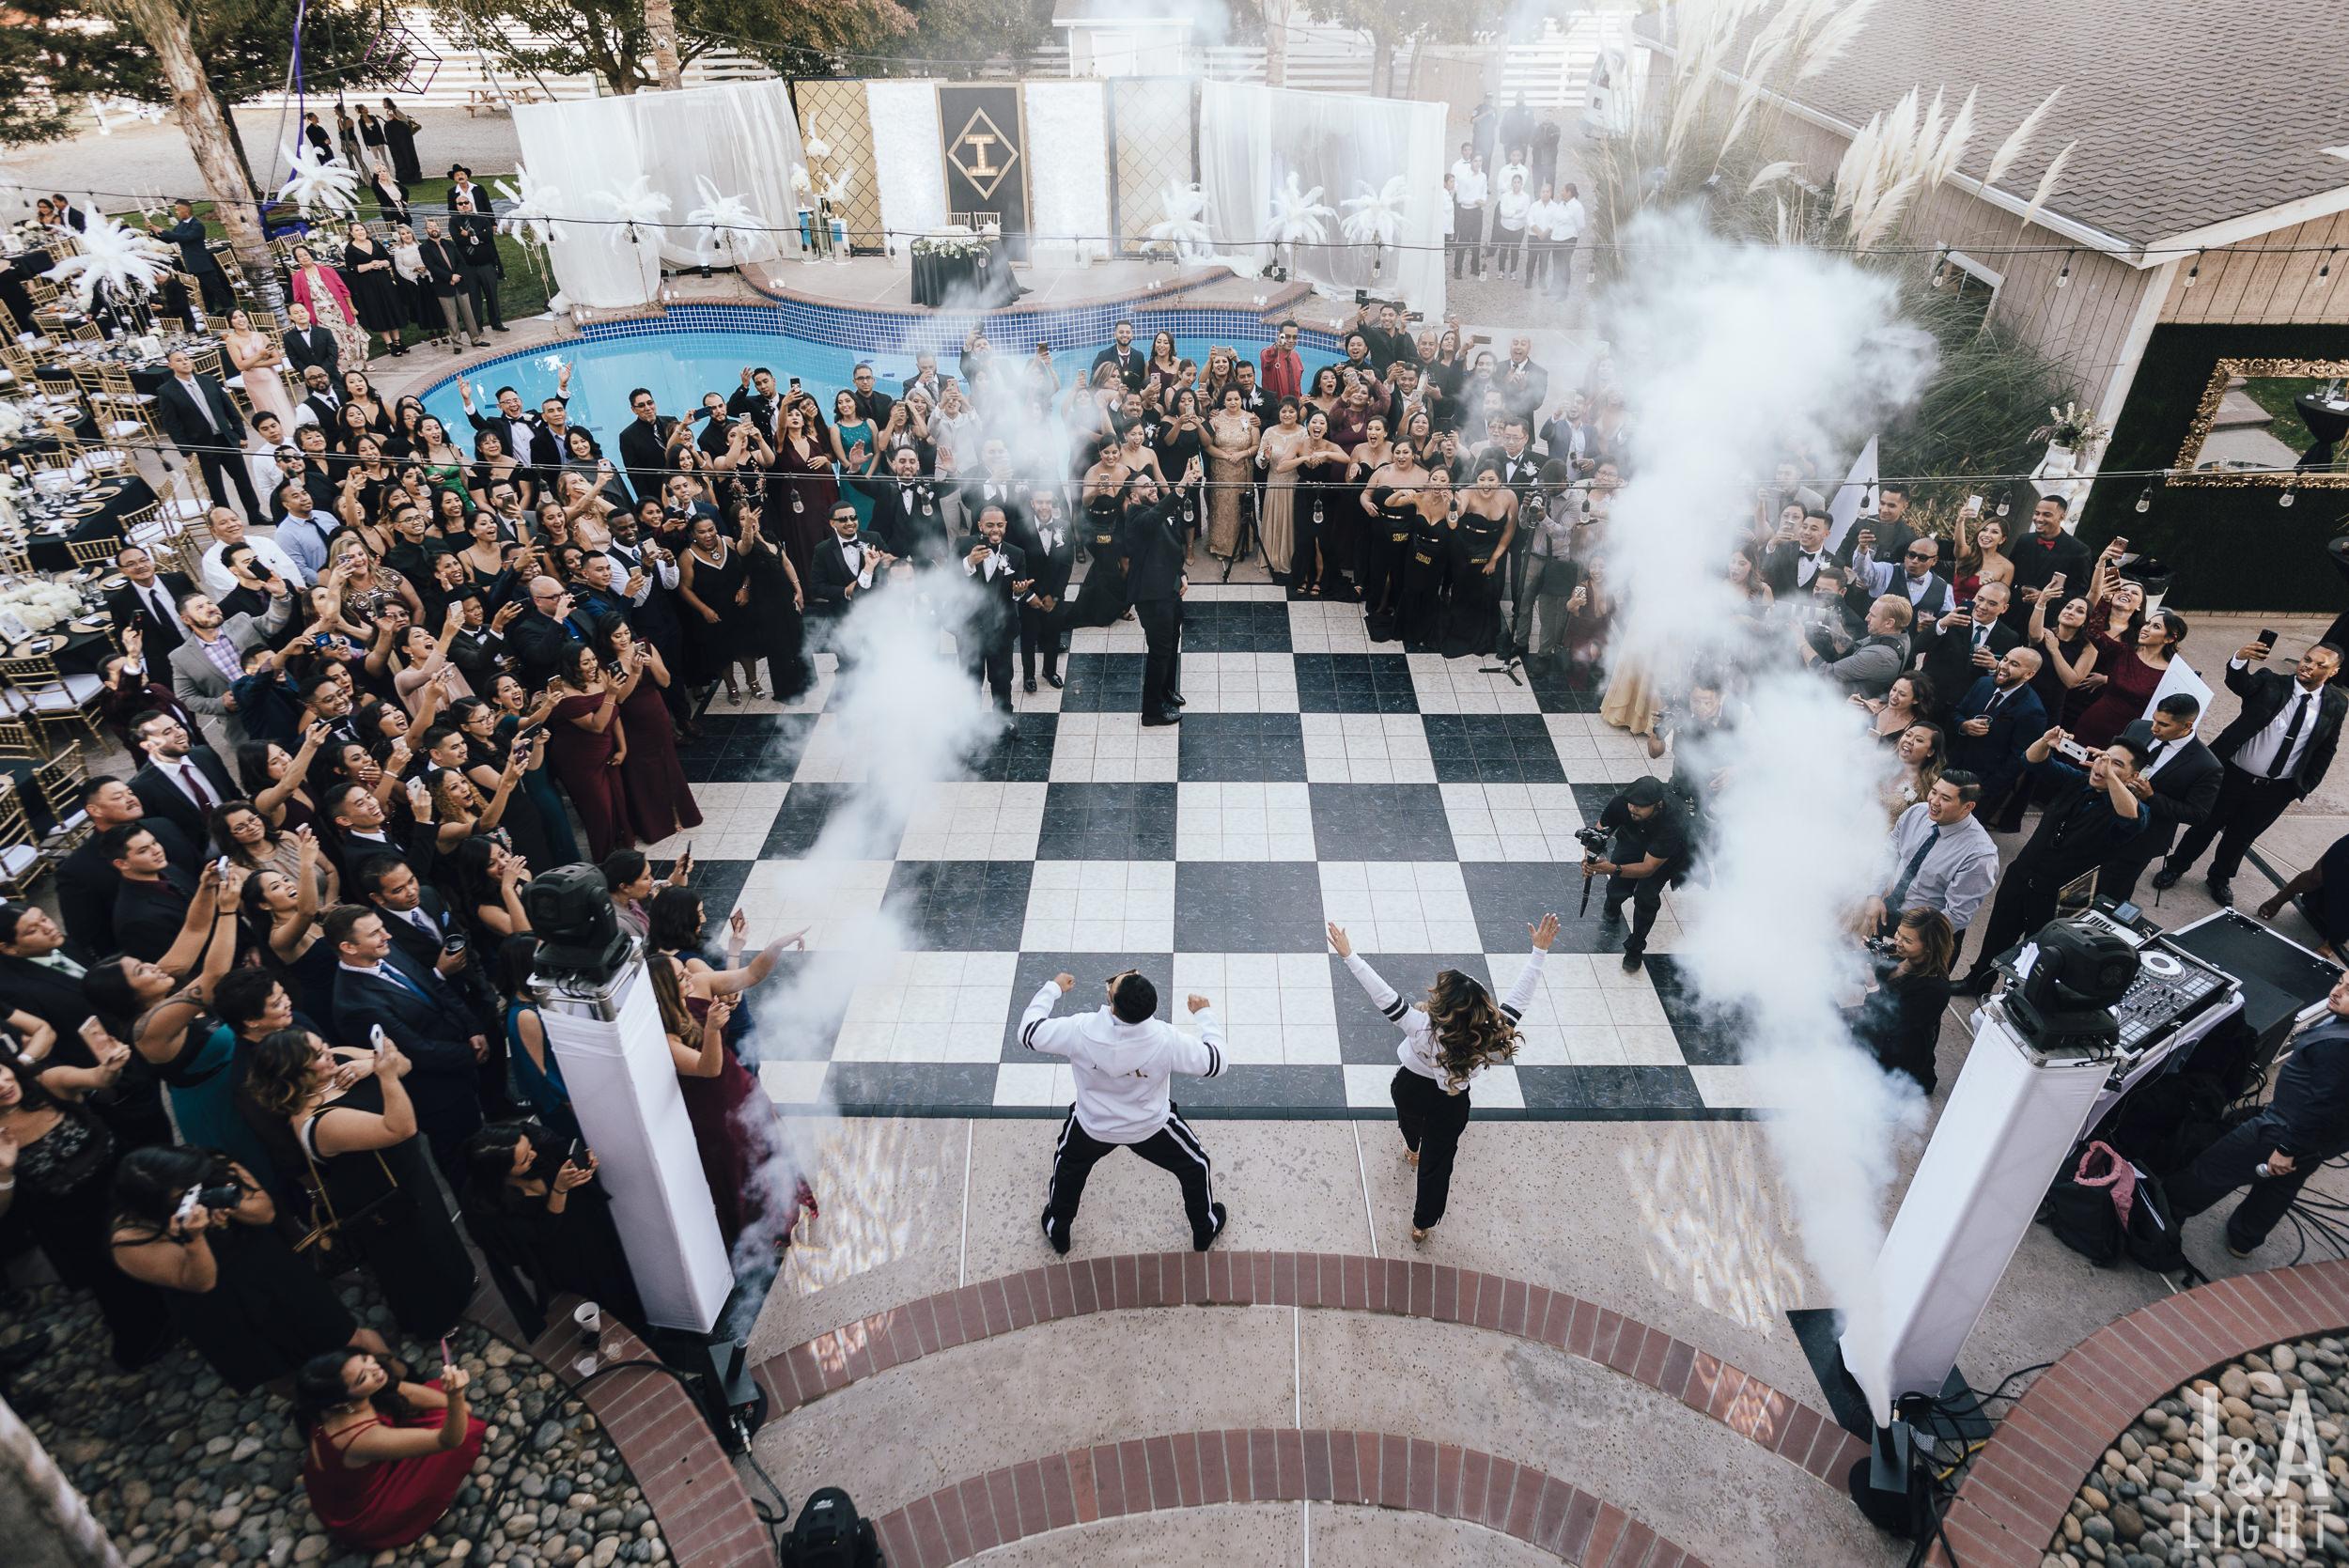 20171014-JanDan-LosBanos-GlassMansion-Wedding-Blog-058.jpg